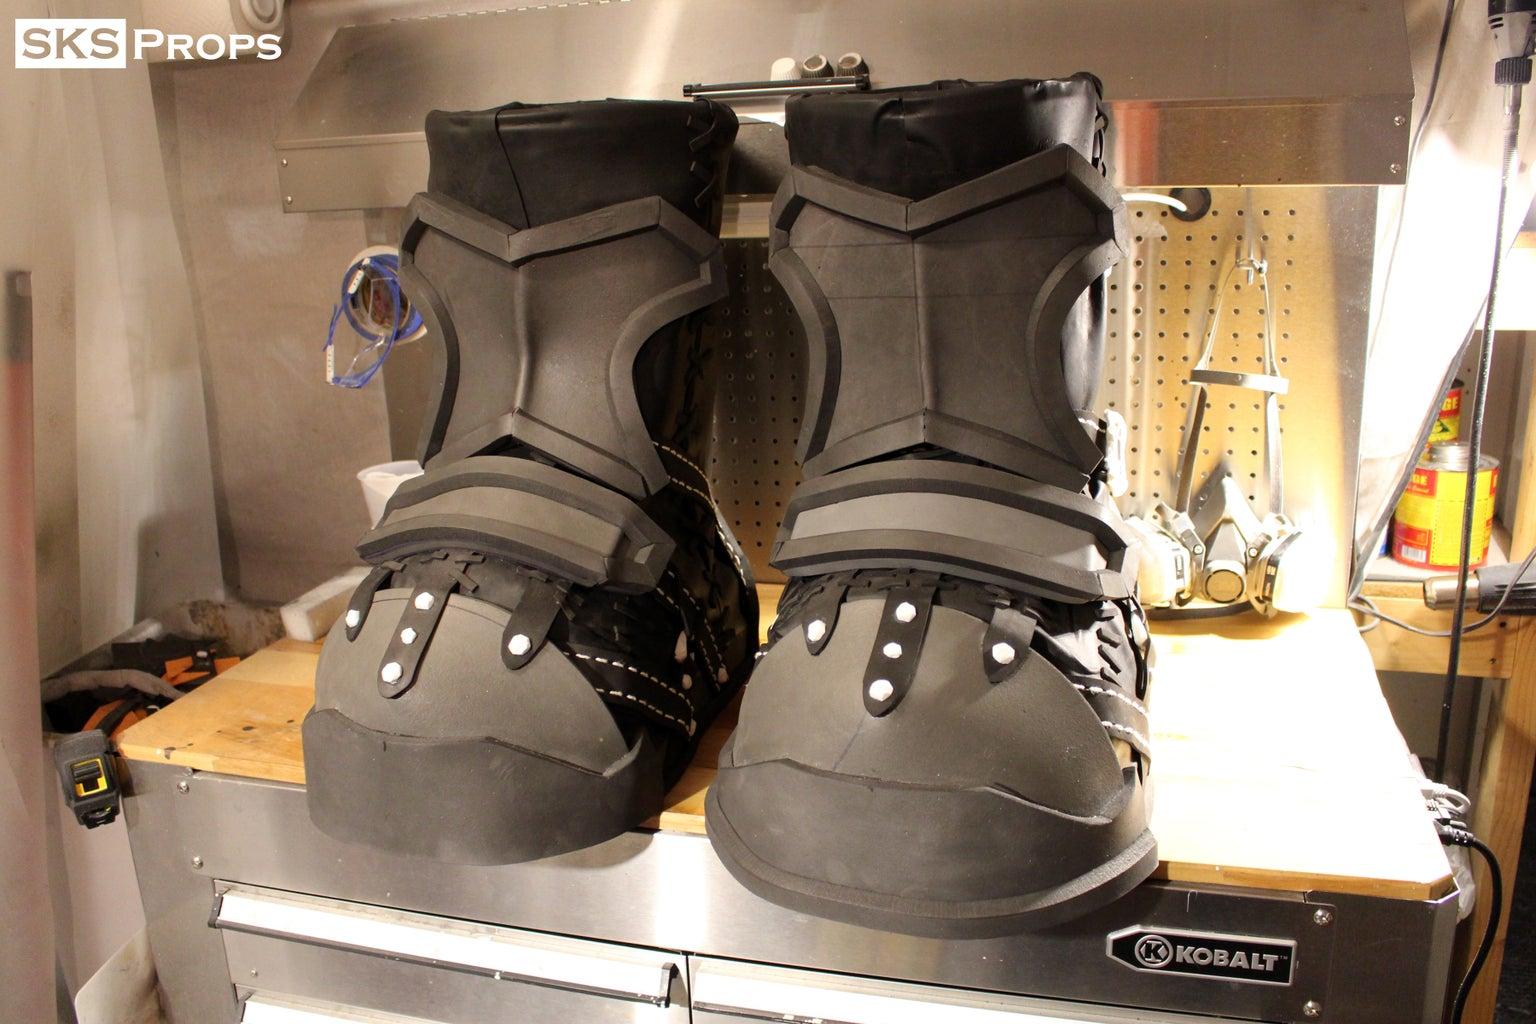 Back to Da Boots!!!